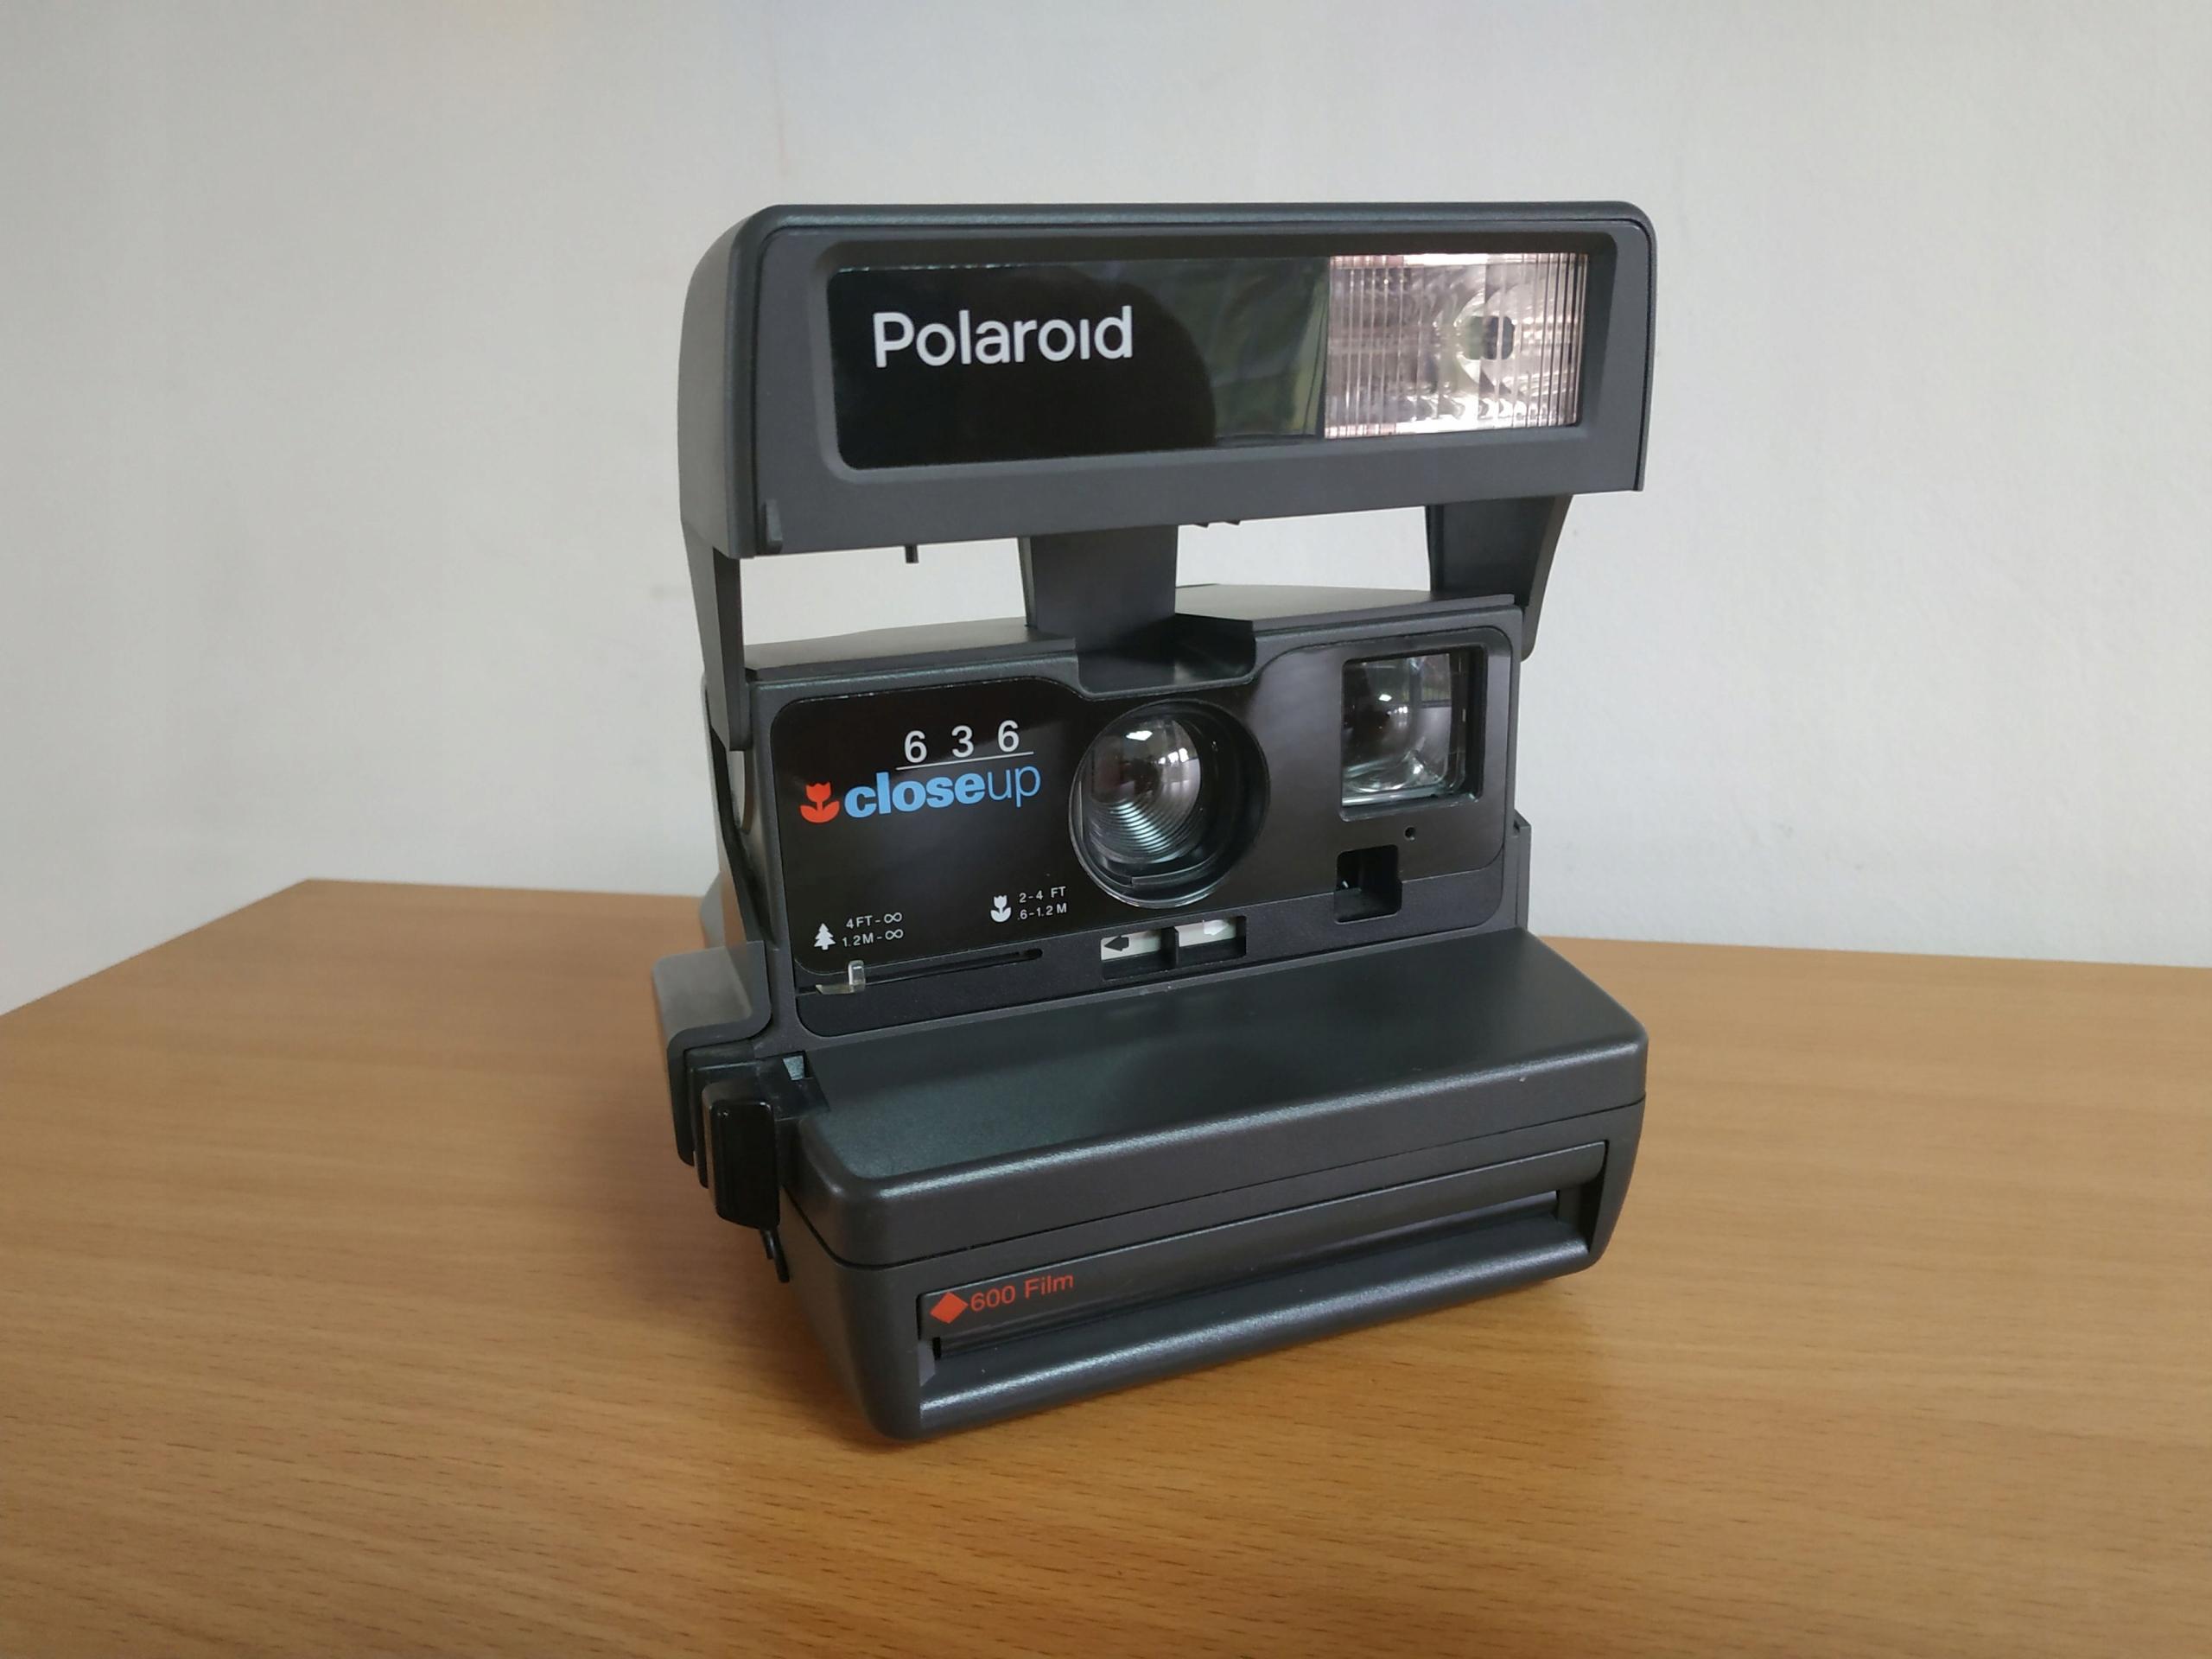 POLAROID 636 CLOSEUP NA FILM TYPU 600